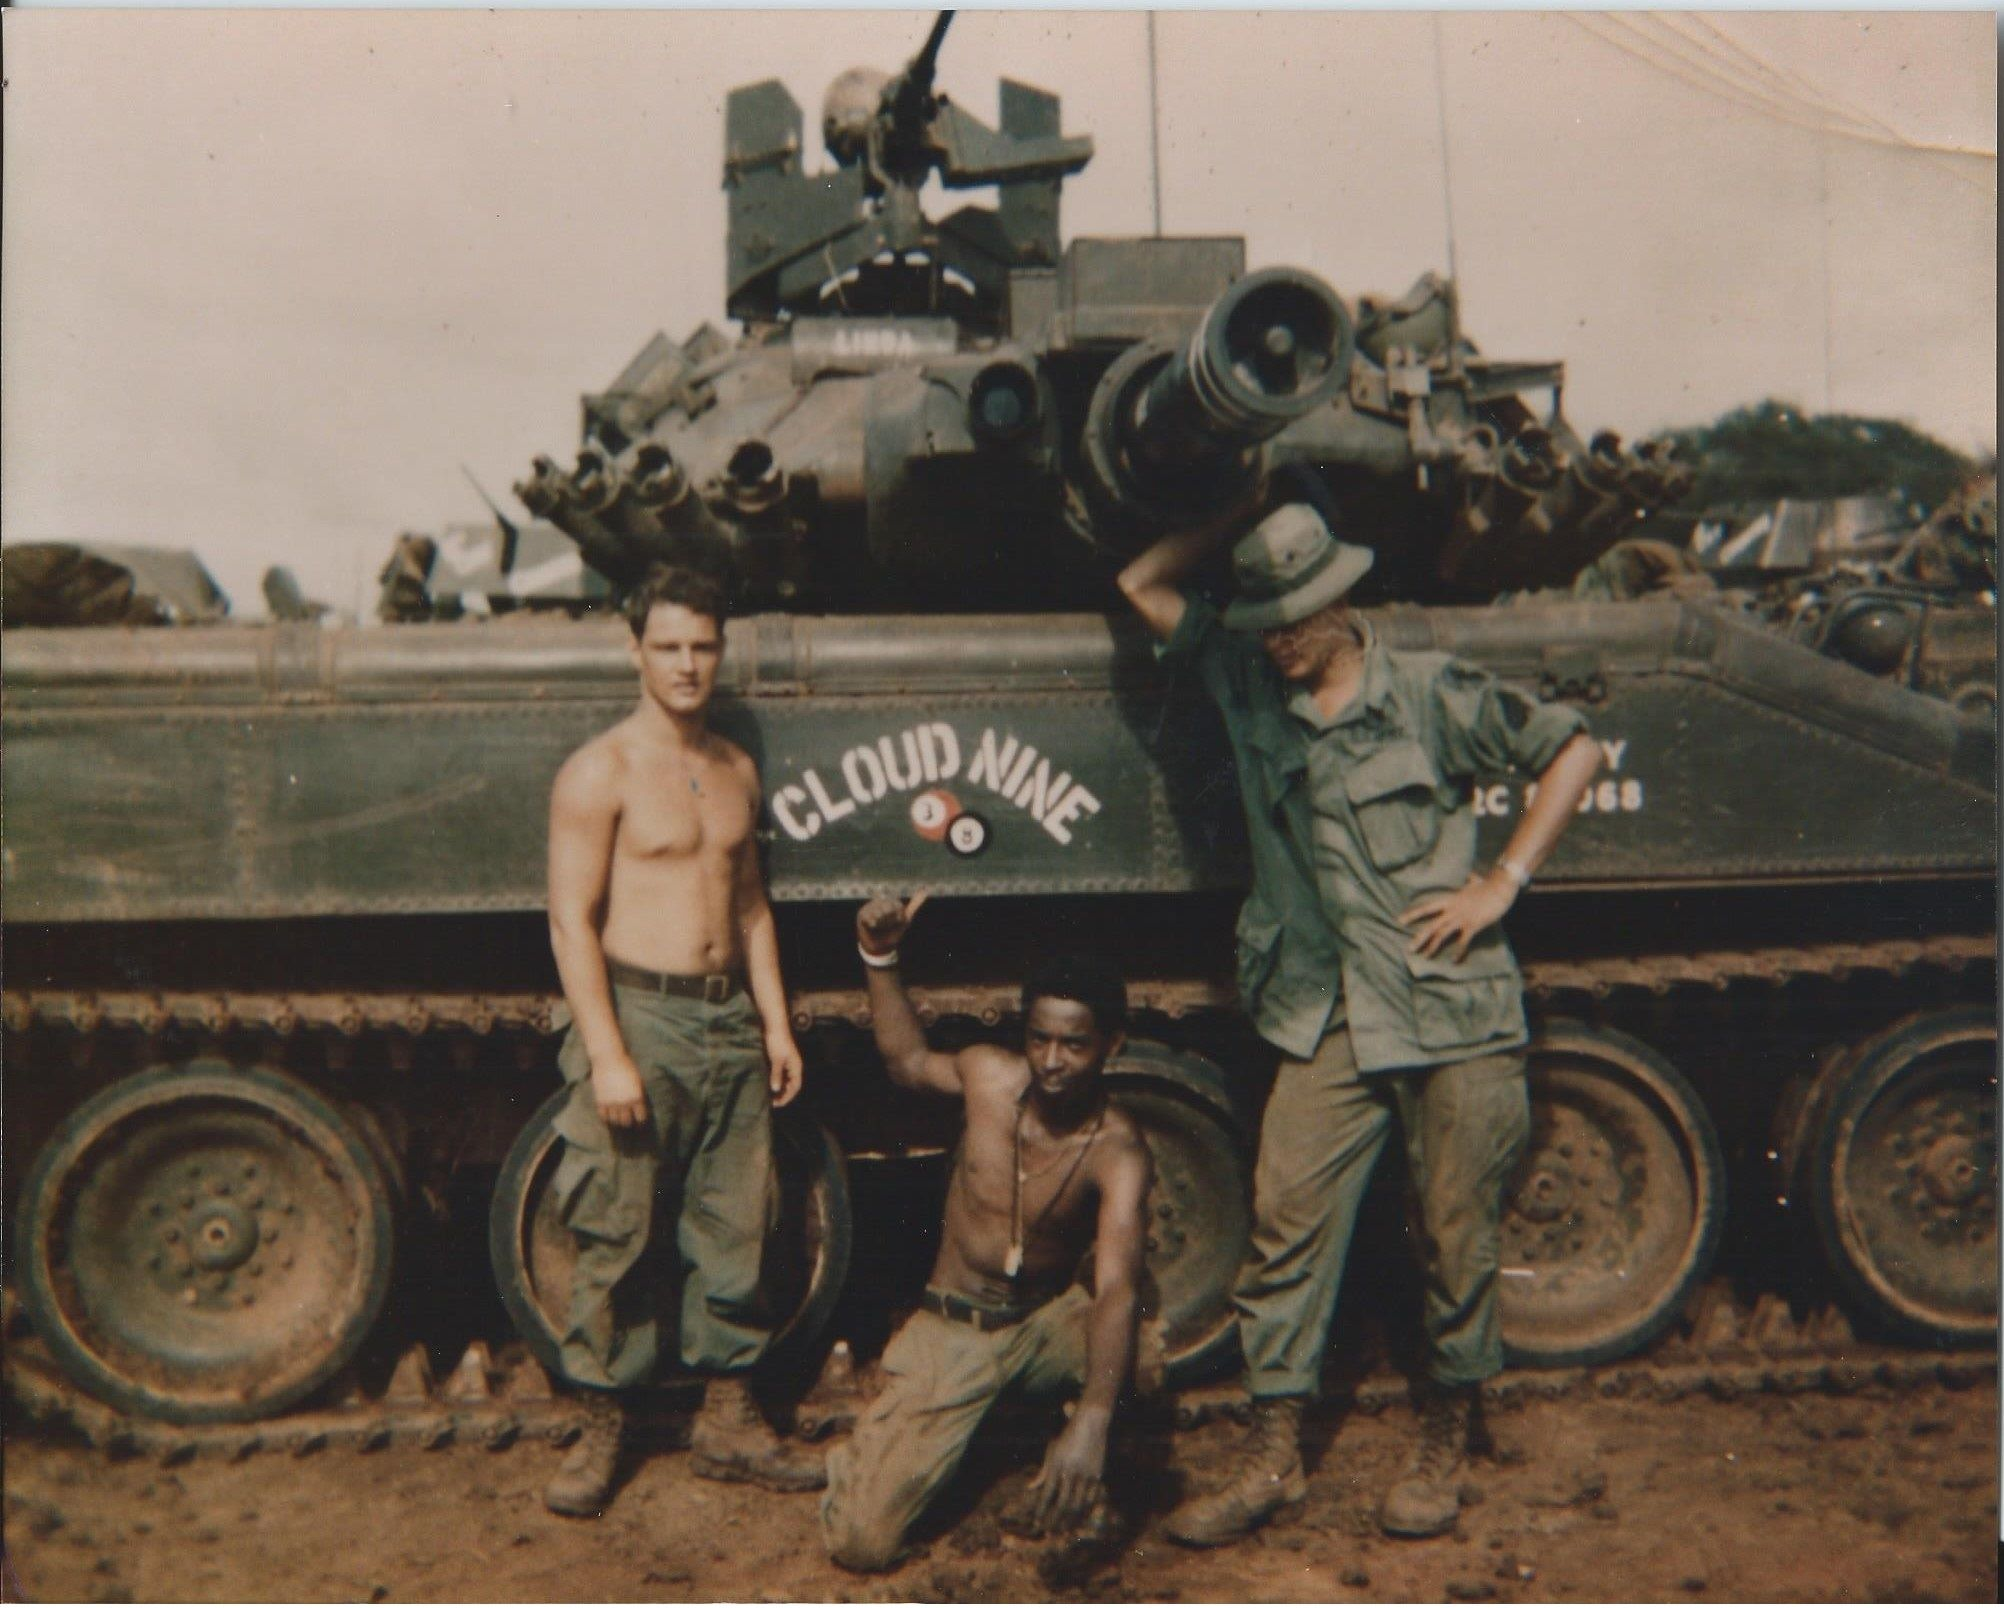 Ron Mihalenko Friends Of The 3rd Squadron 11th Armored Cavalry In Quan Loi Viet Nam In 1969 M551 Sheridan Clou Vietnam War Vietnam Tank Cold War Military